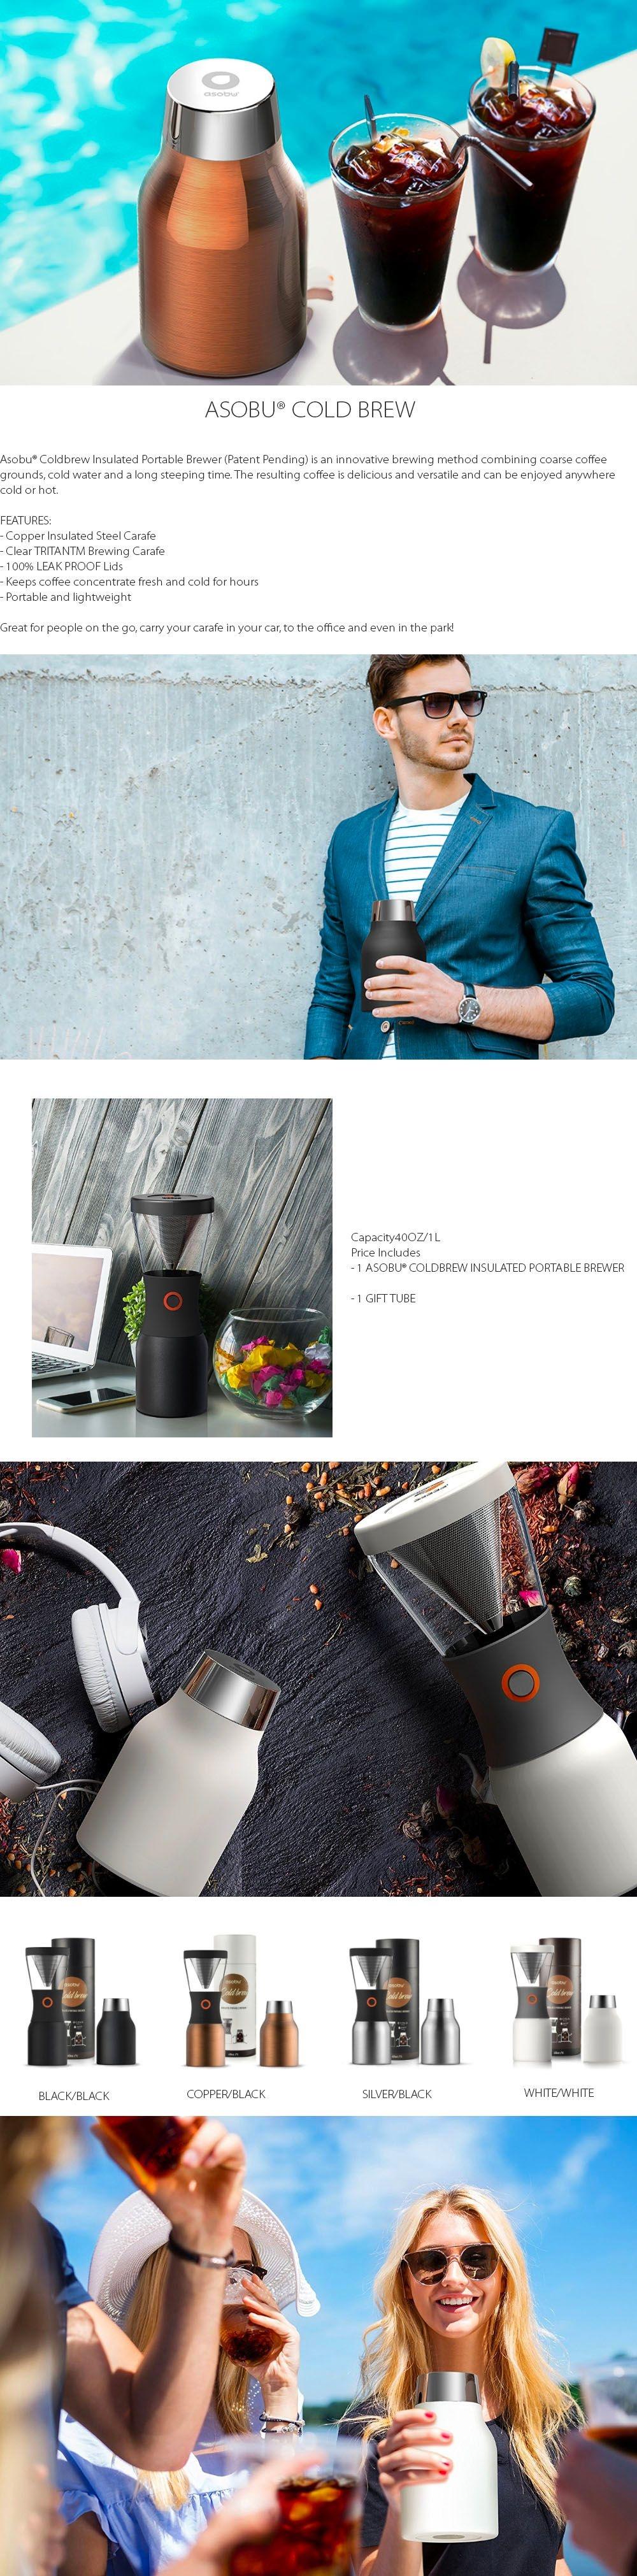 Asobu Coldbrew Coffee Maker Portable Brewer